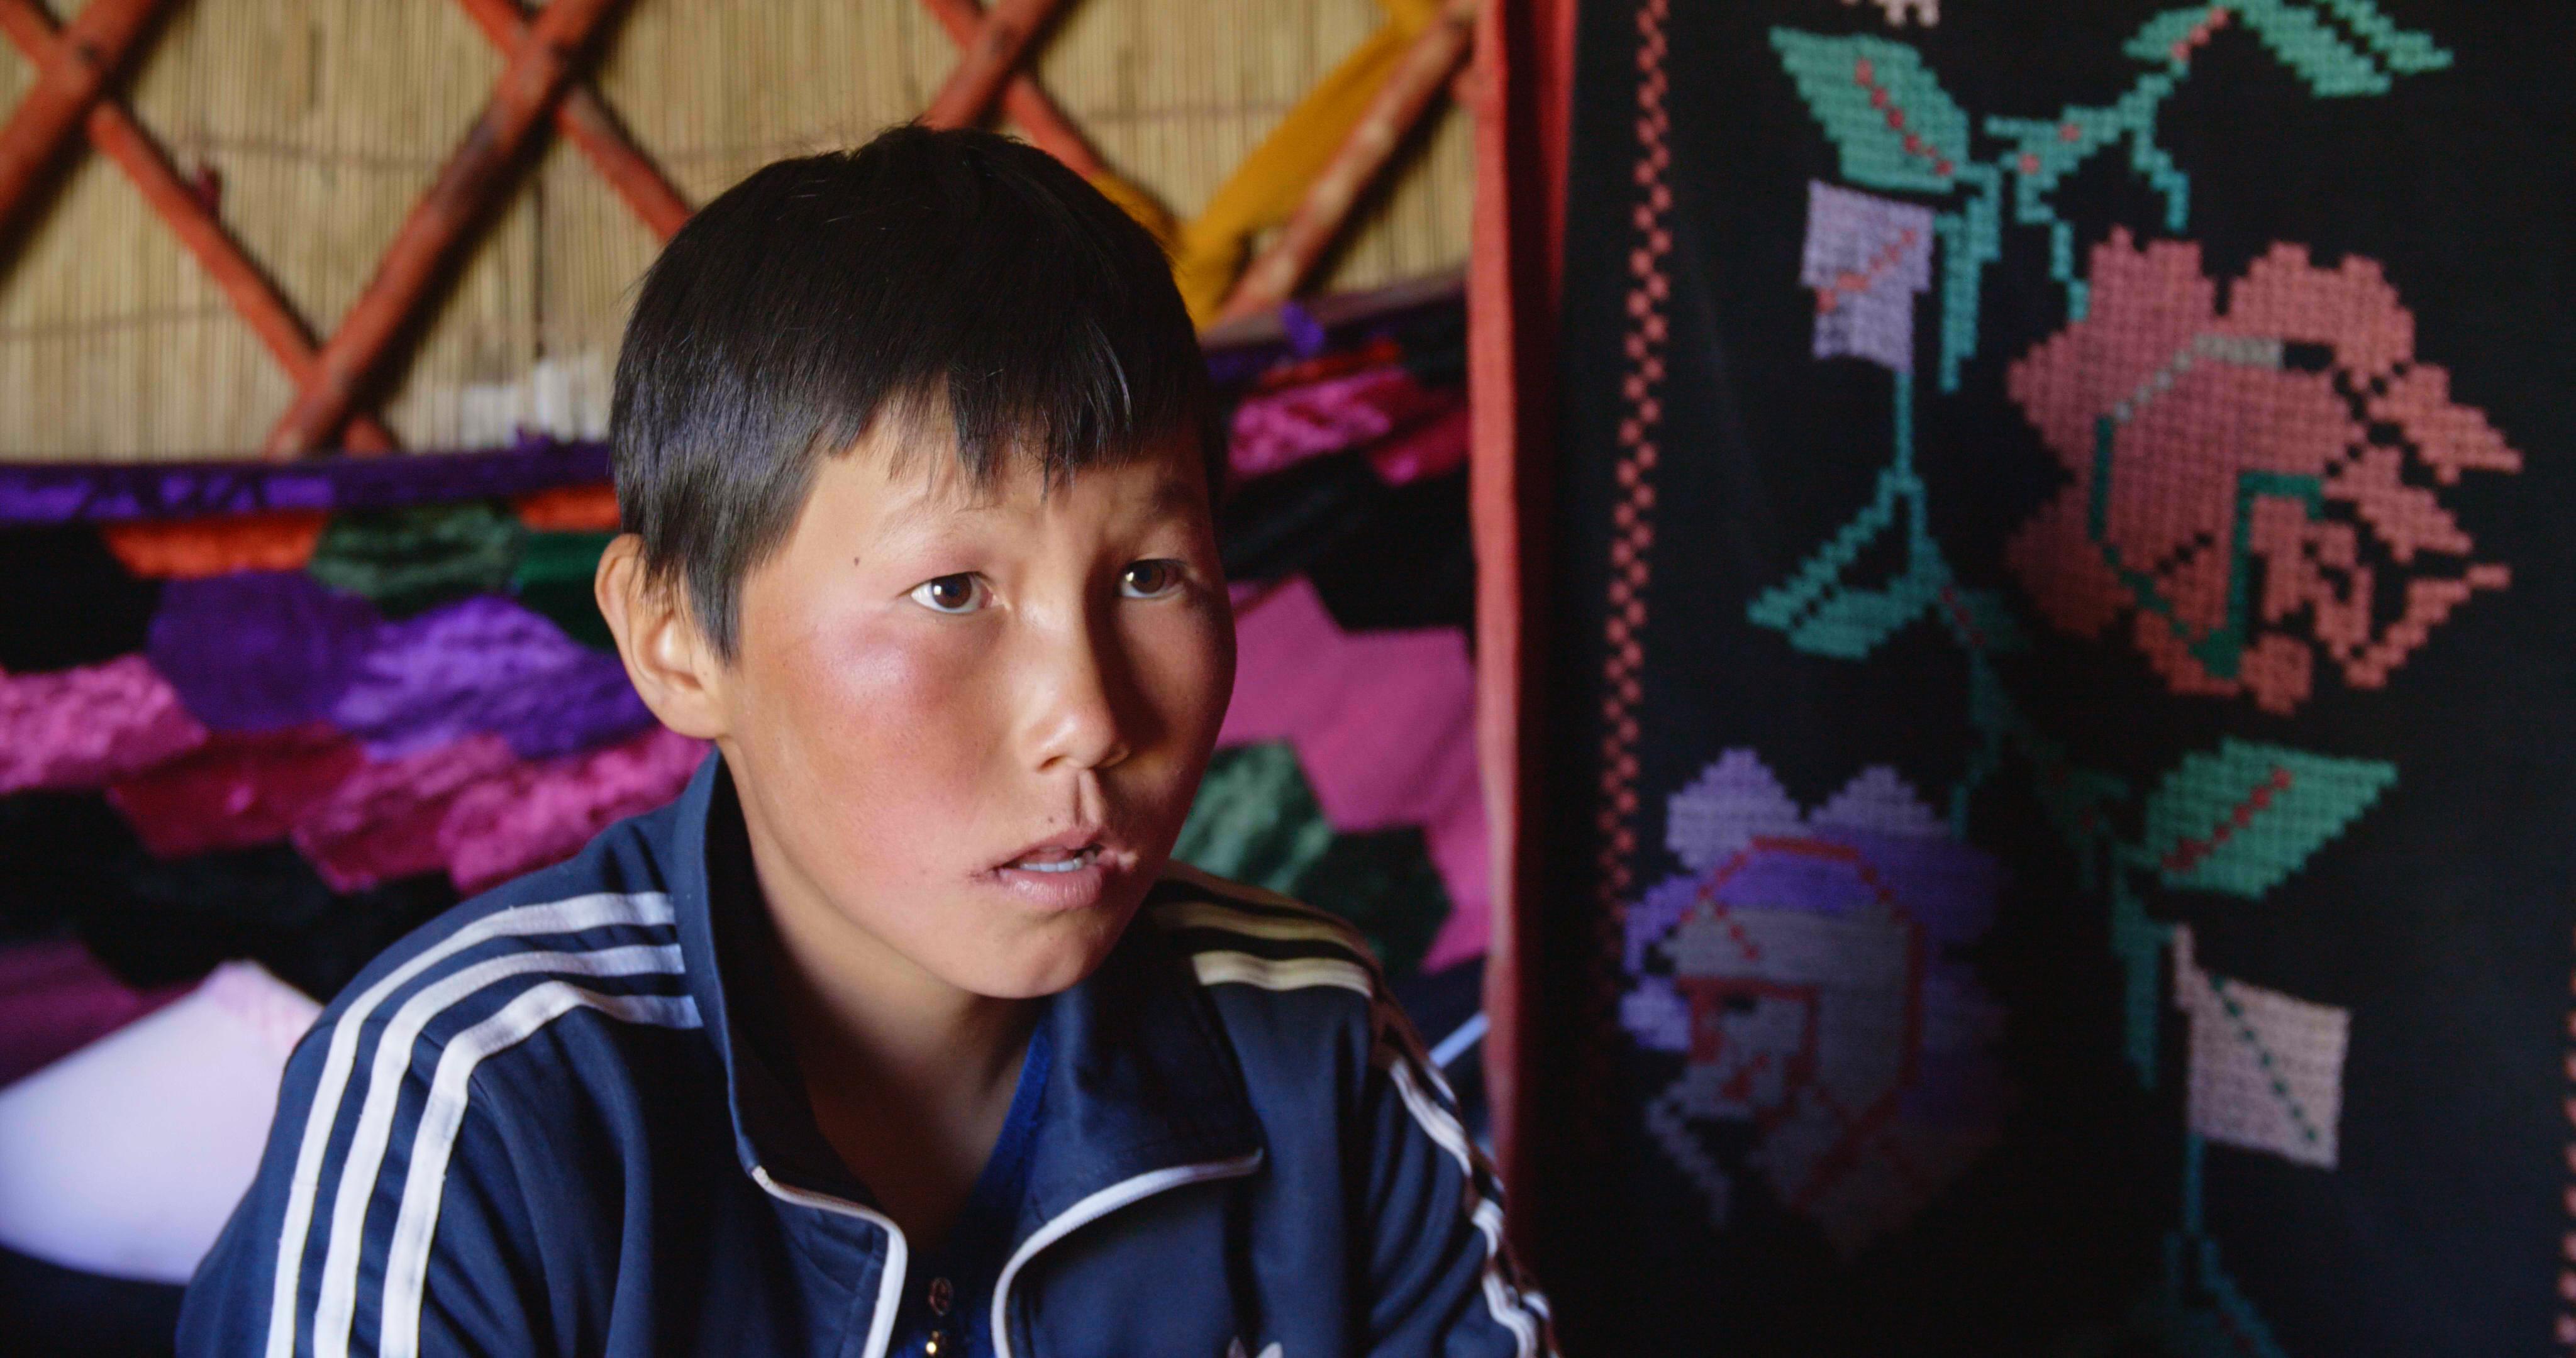 TheBoyFromKyrgyzstan_Stills_1.1.1